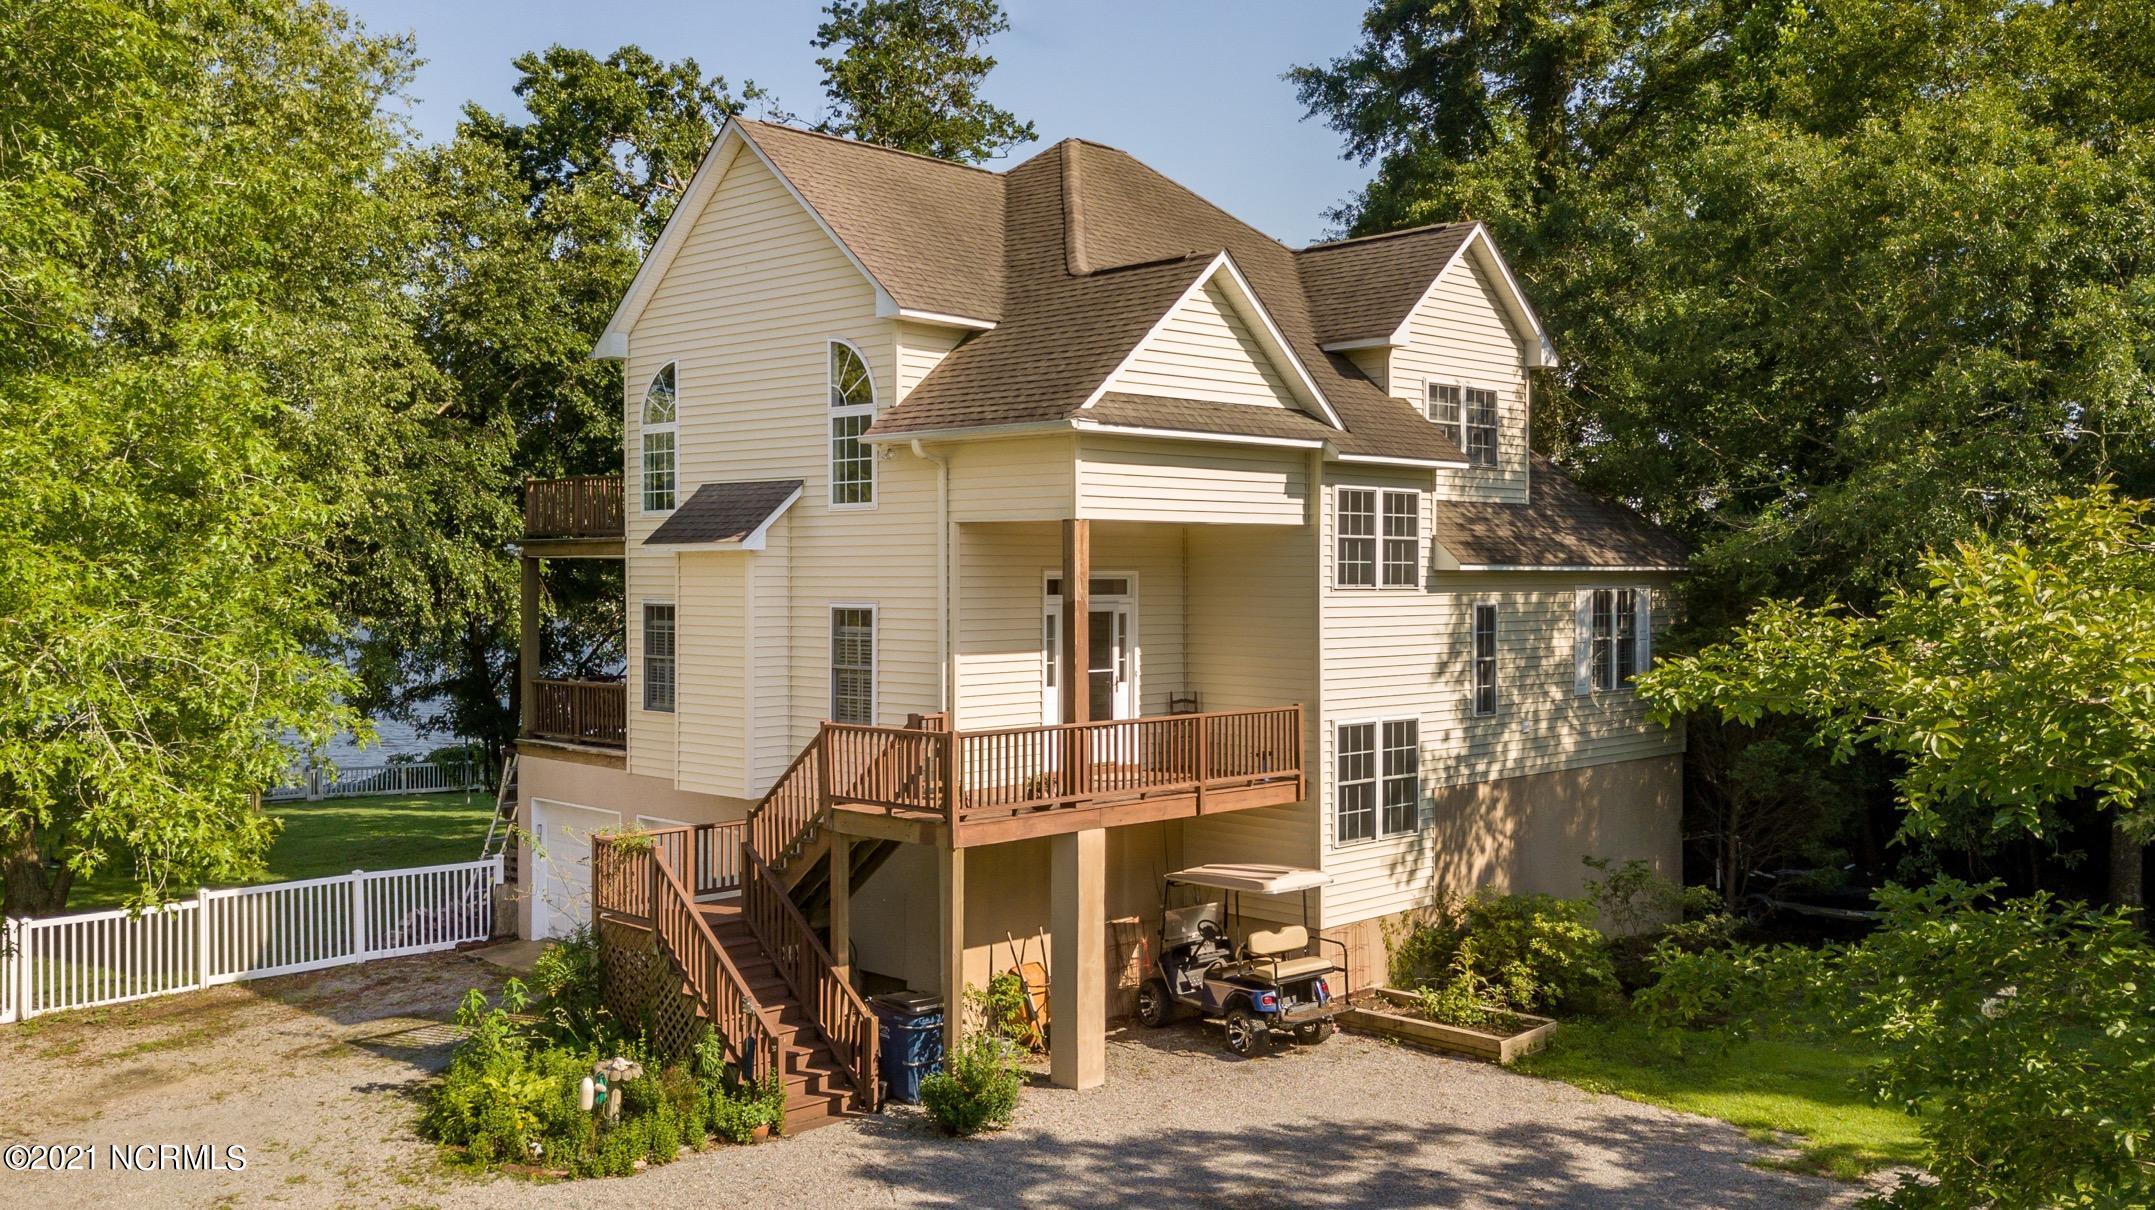 245 Bath Creek Landing Road, Bath, North Carolina 27808, 3 Bedrooms Bedrooms, 8 Rooms Rooms,2 BathroomsBathrooms,Single family residence,For sale,Bath Creek Landing,100277834